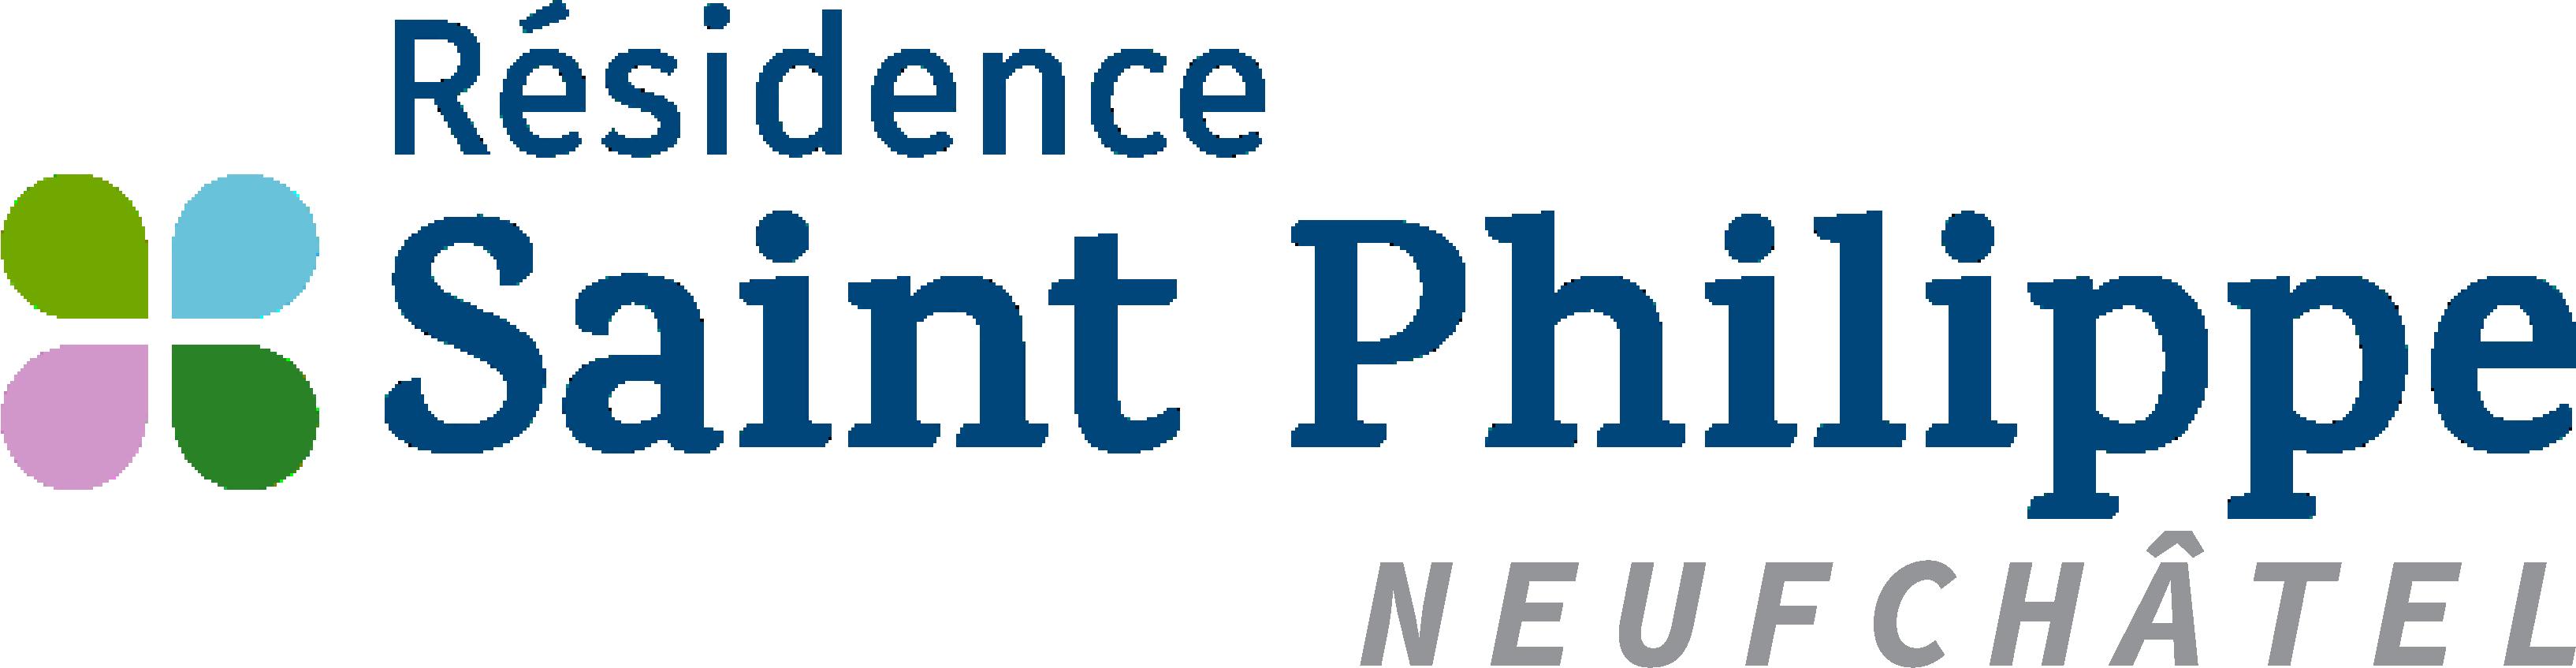 Résidence Saint-Philippe